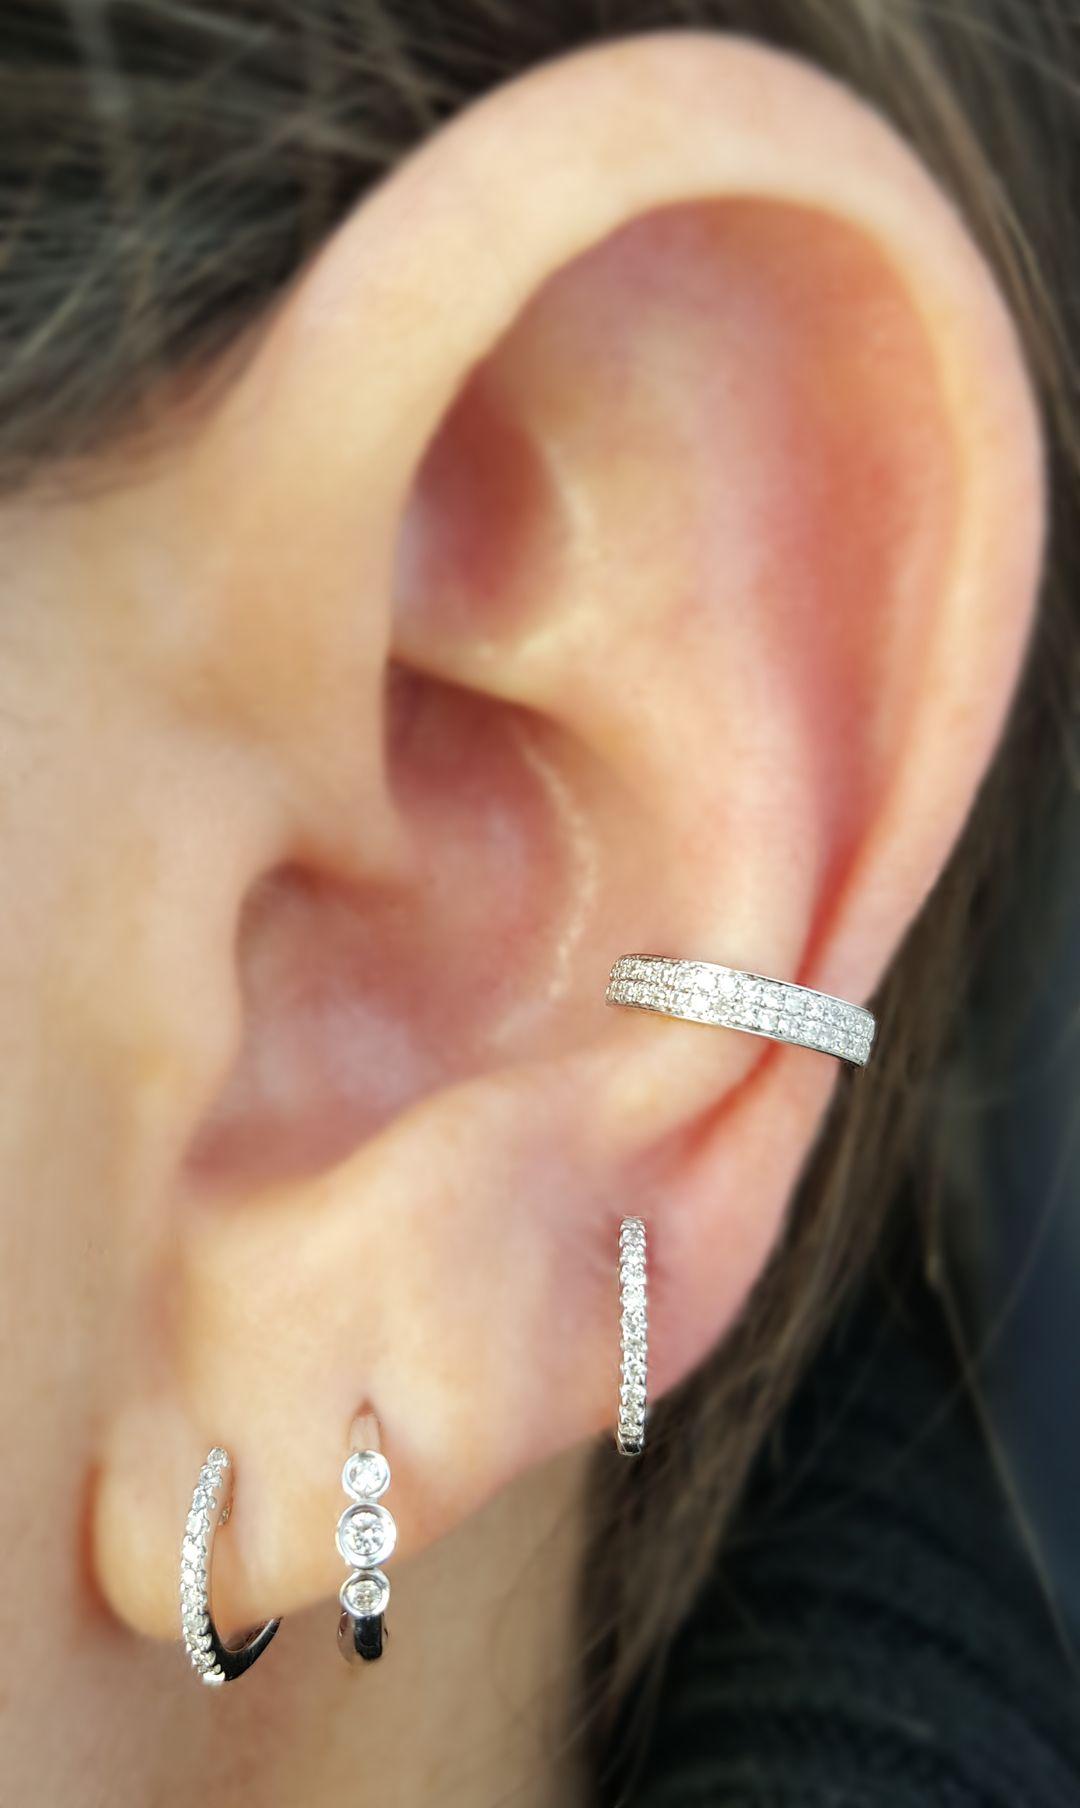 Piercing nose diamond  A White Gold and Diamond Hoop Ear Story Three Diamond Hoop with